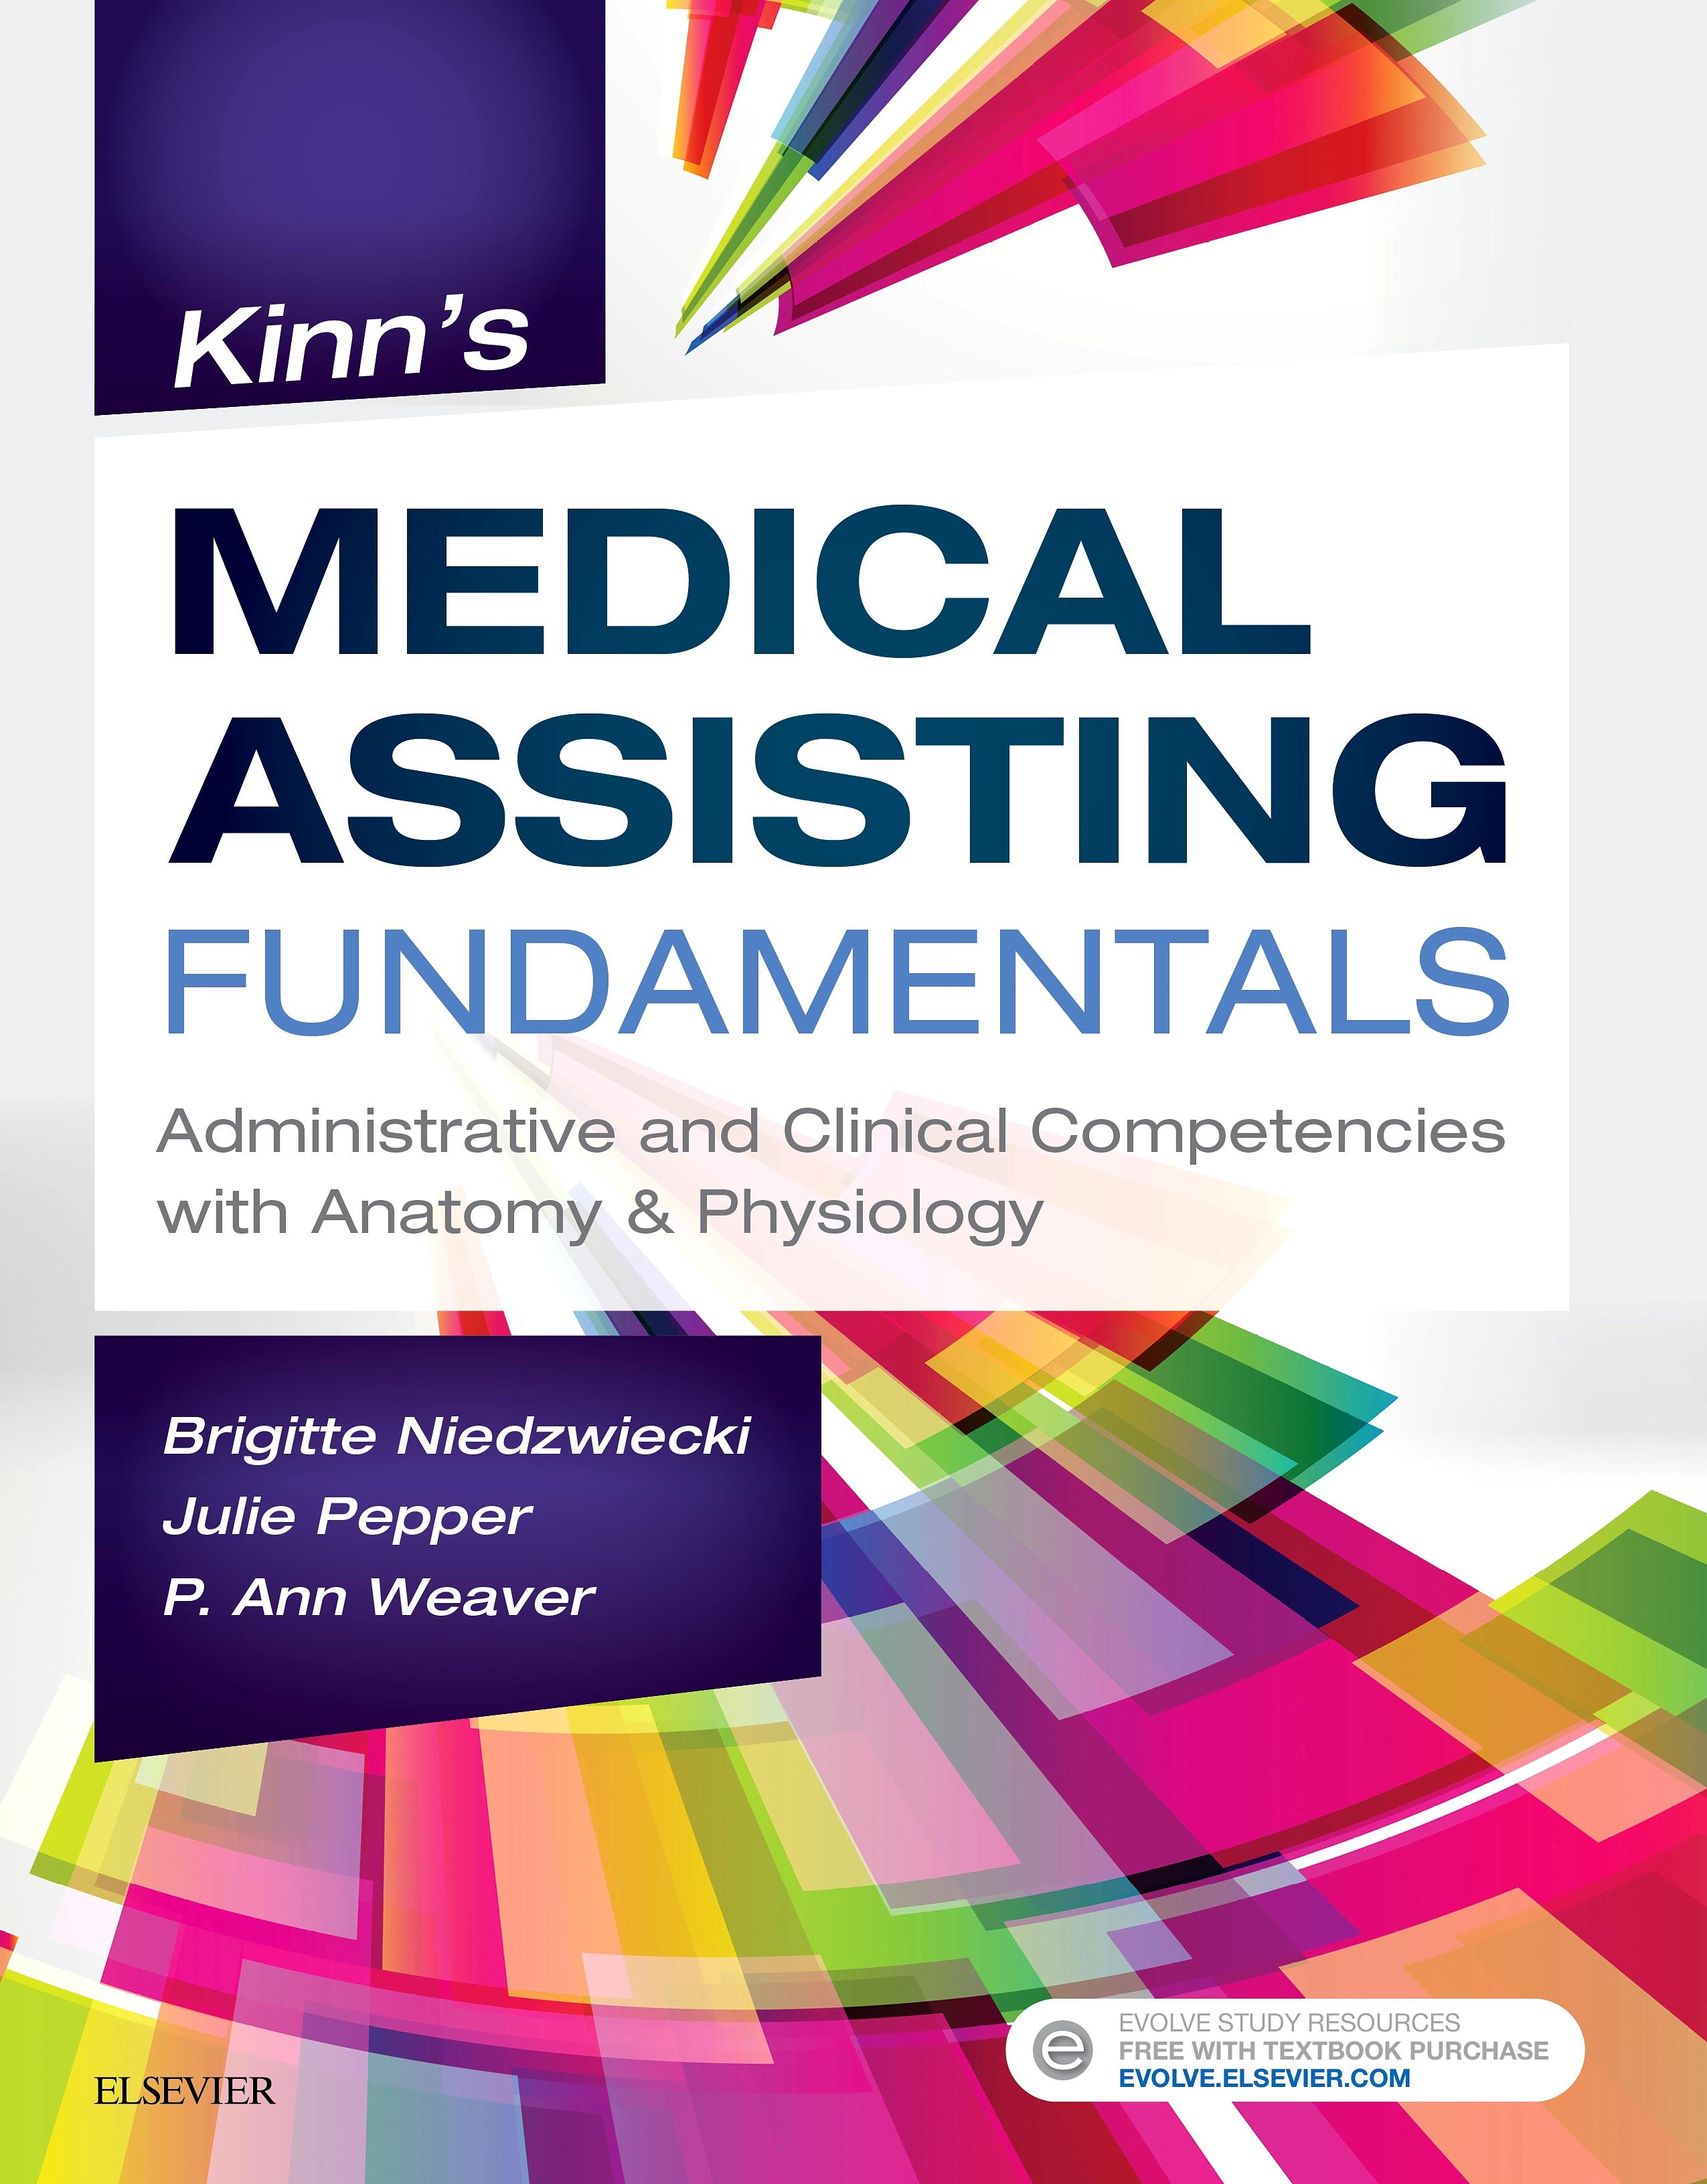 Evolve Resources for Kinn's Medical Assisting Fundamentals